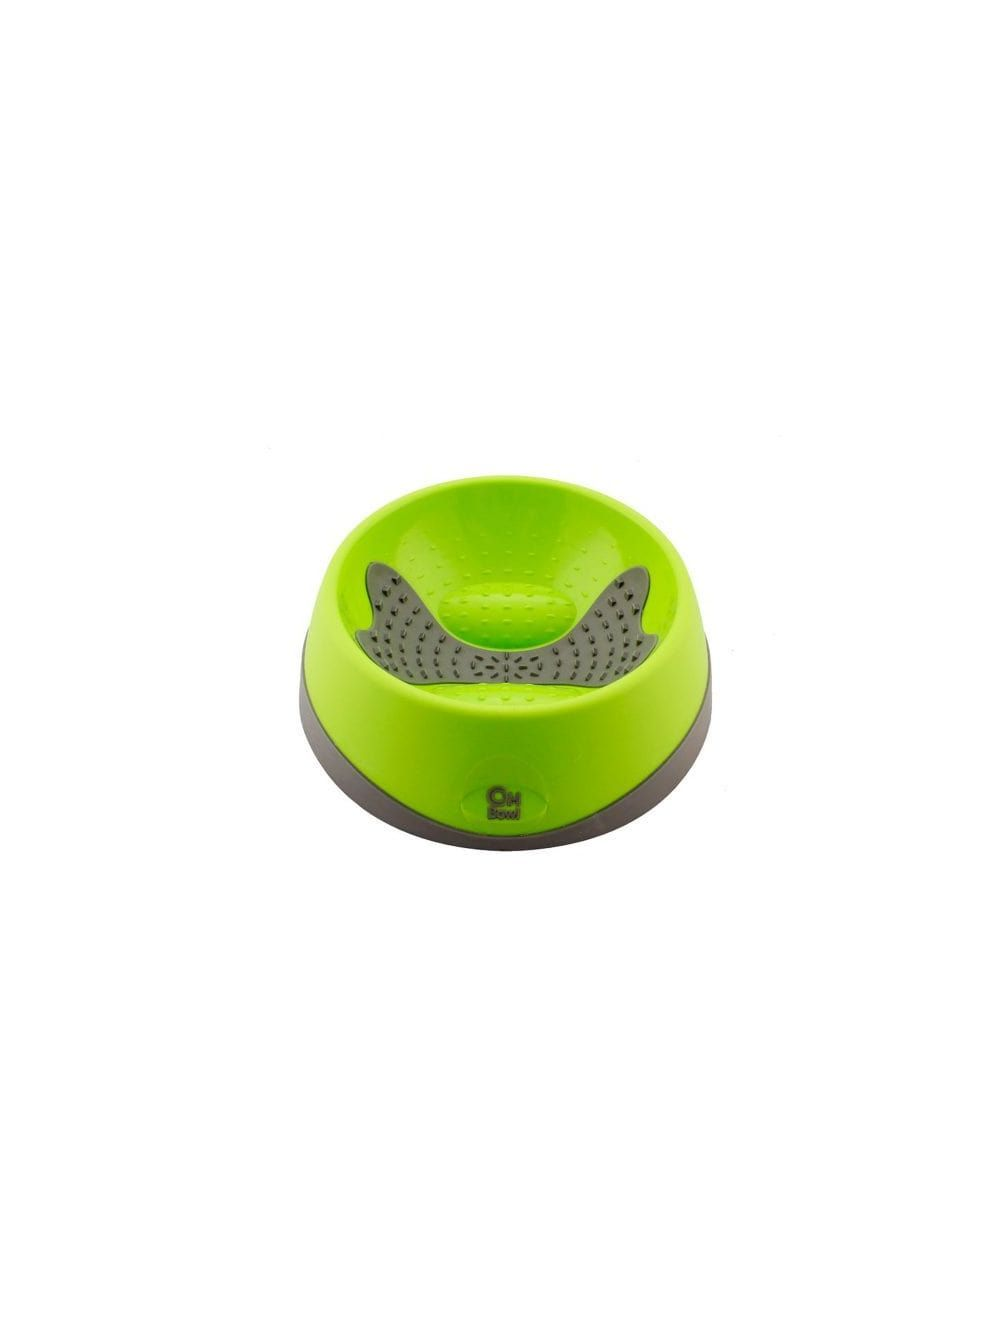 Hyper pet OHBowl verde mediano